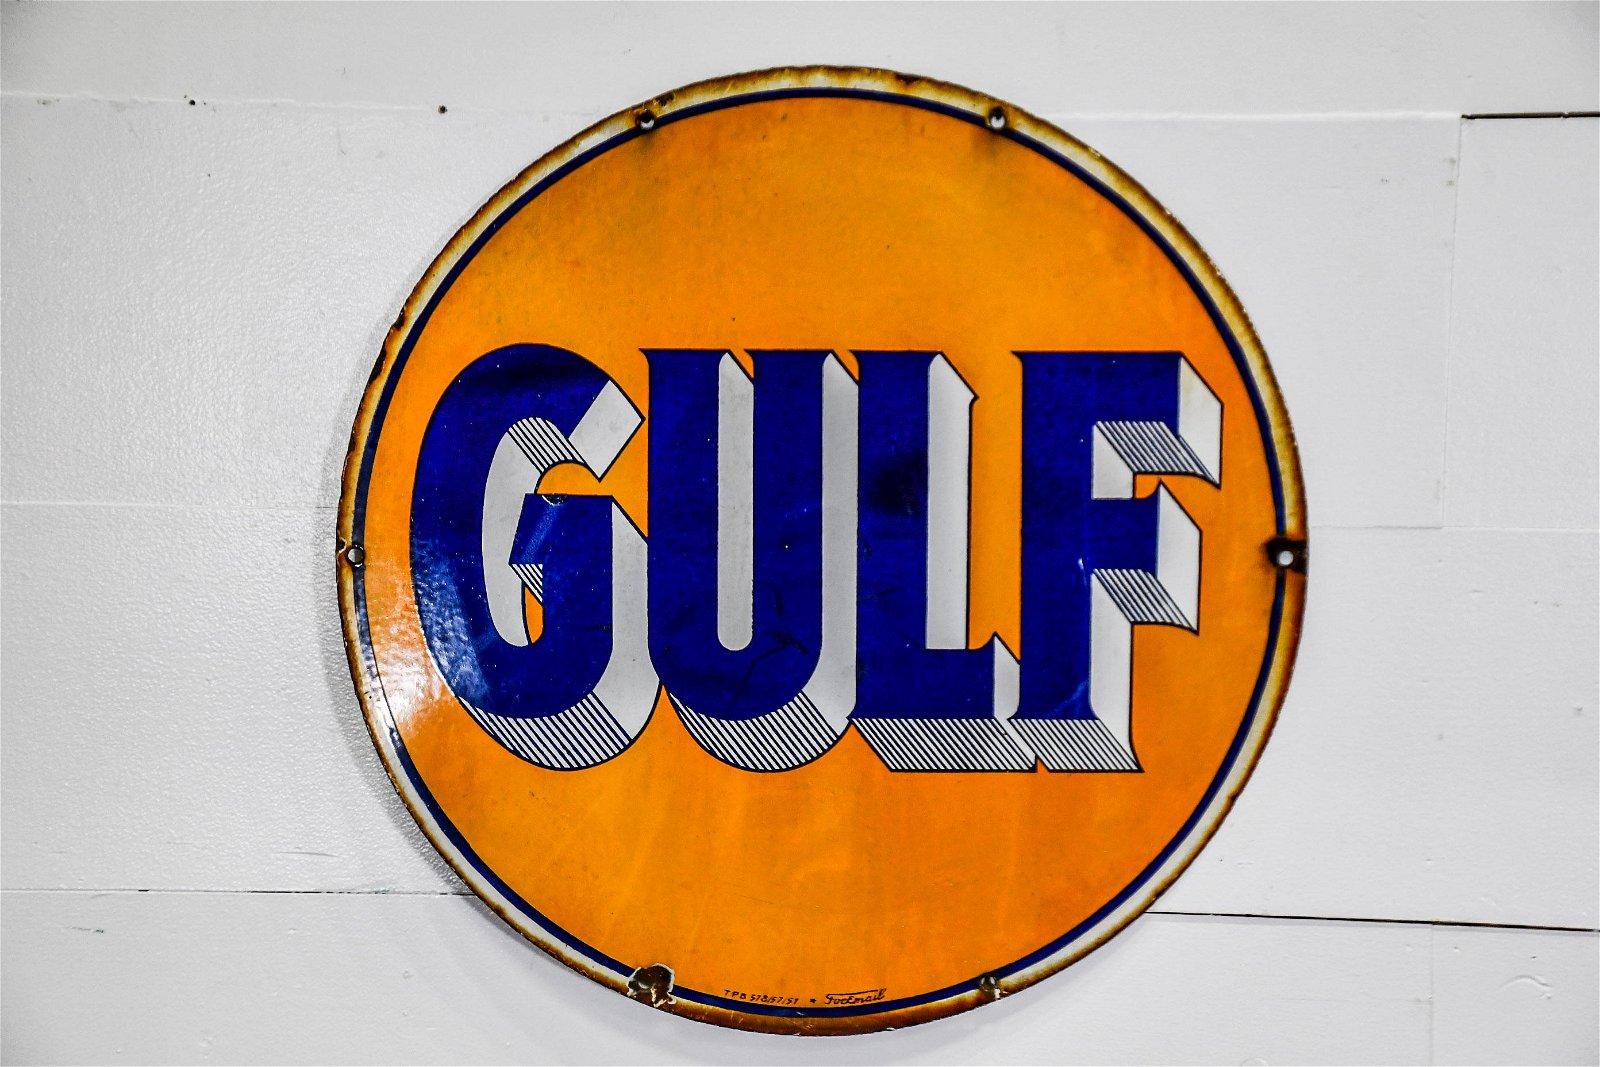 "French Gulf Sign 27 1/2"" diam."